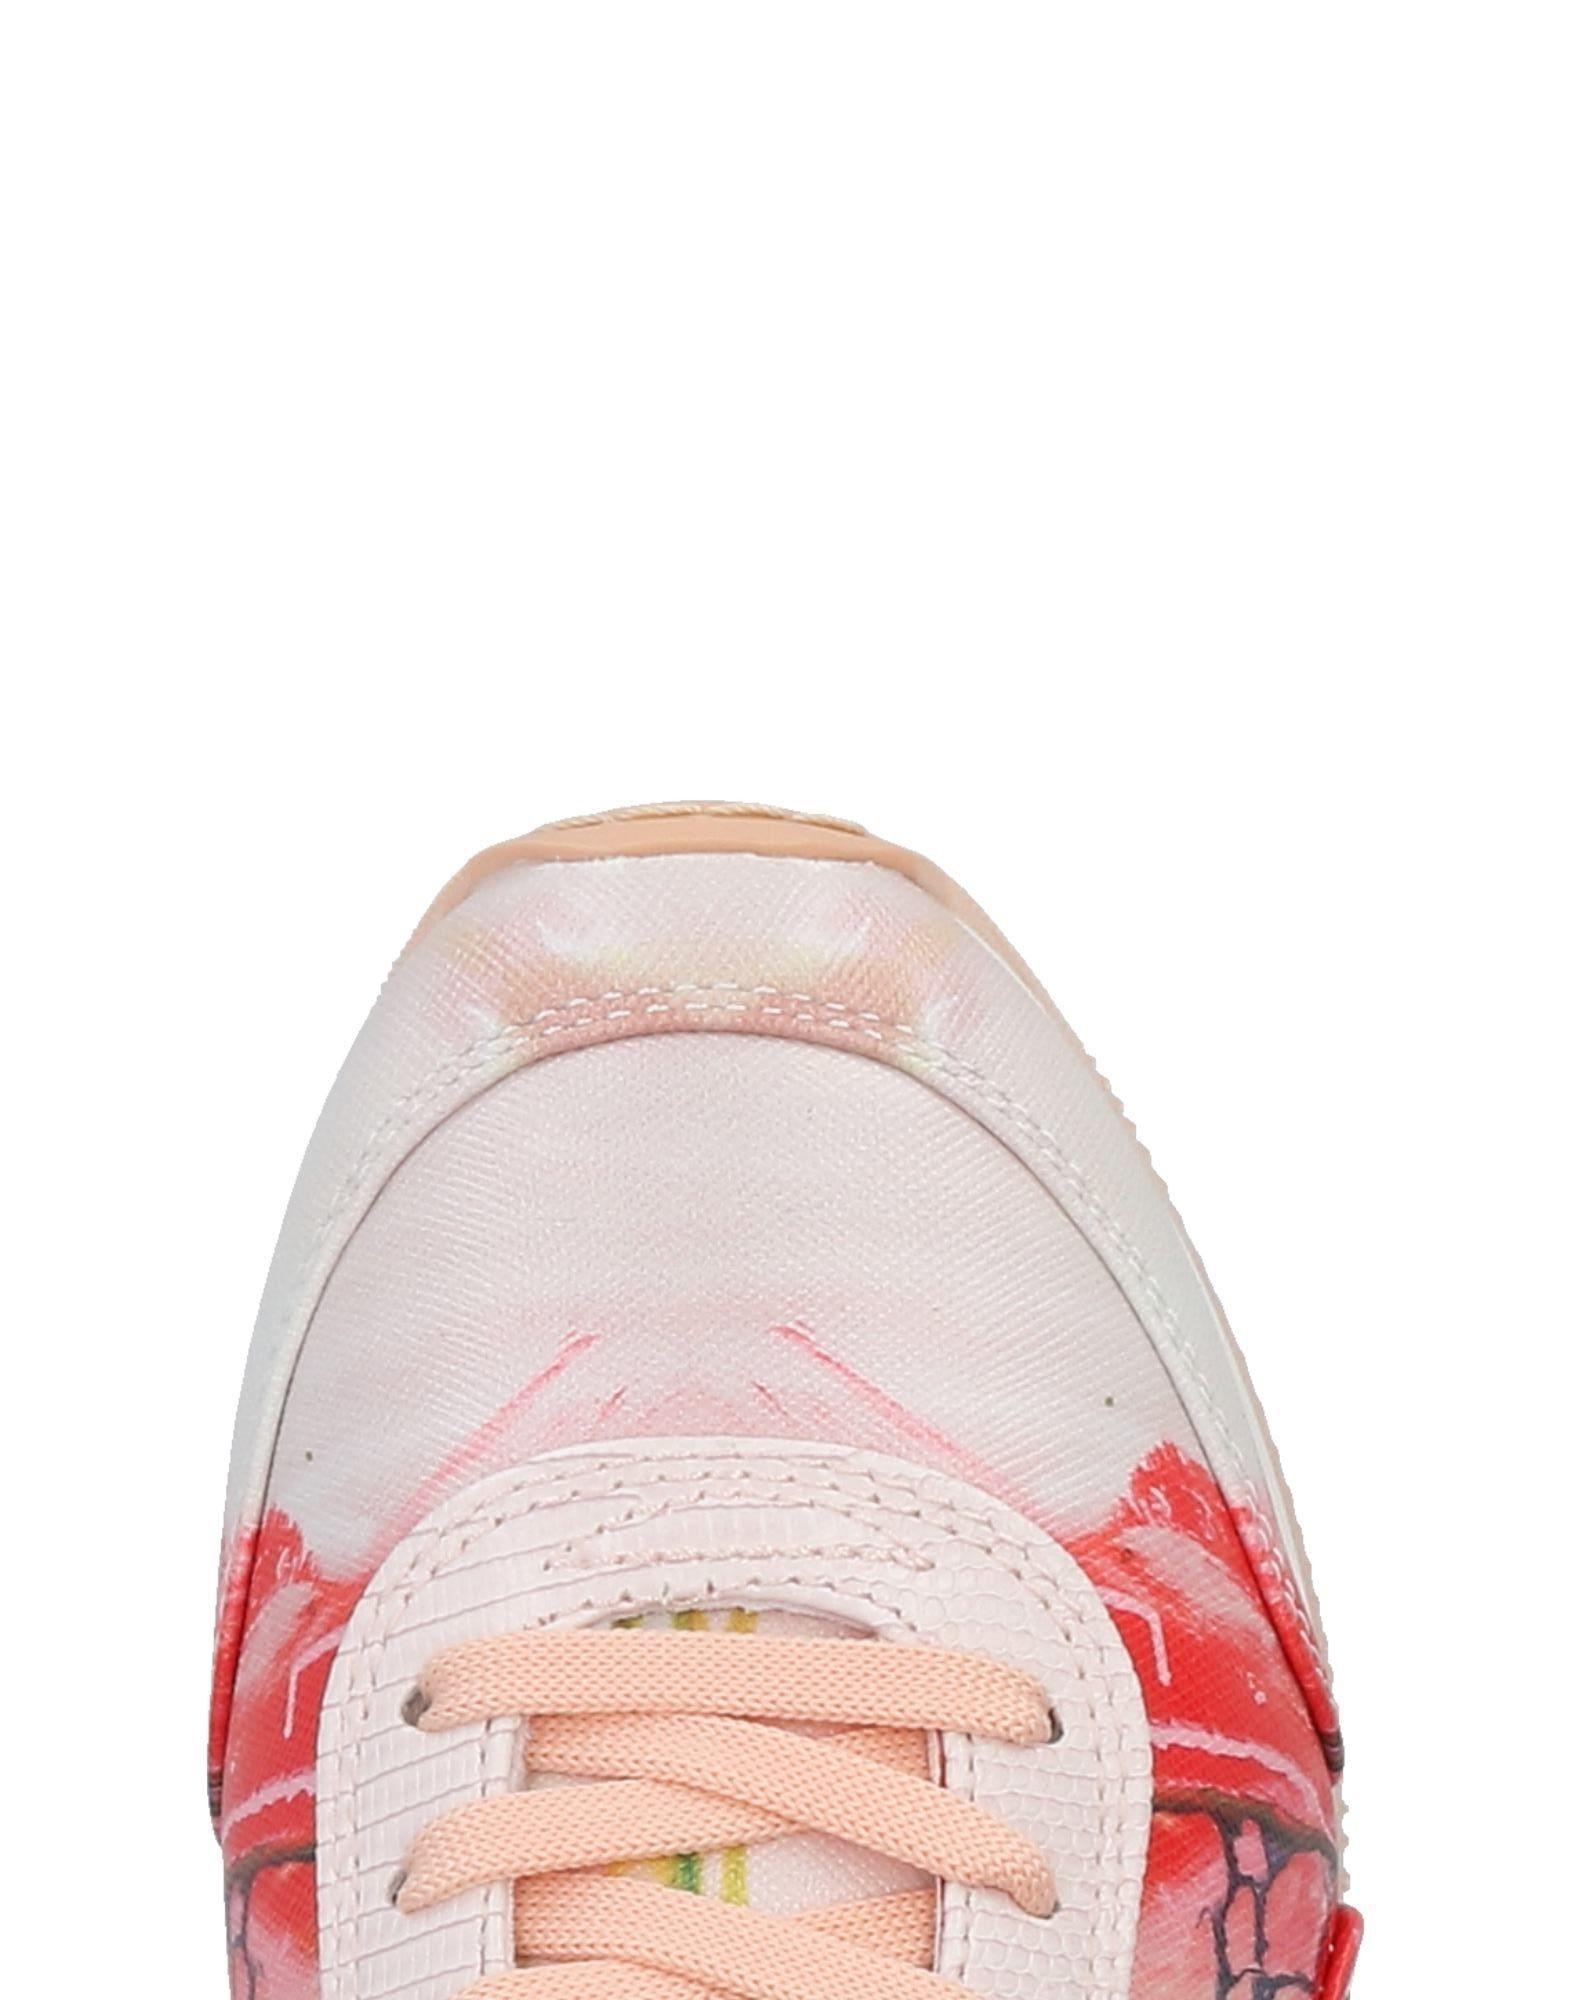 Desigual Sneakers Damen   Damen 11439154LA  8ca9da